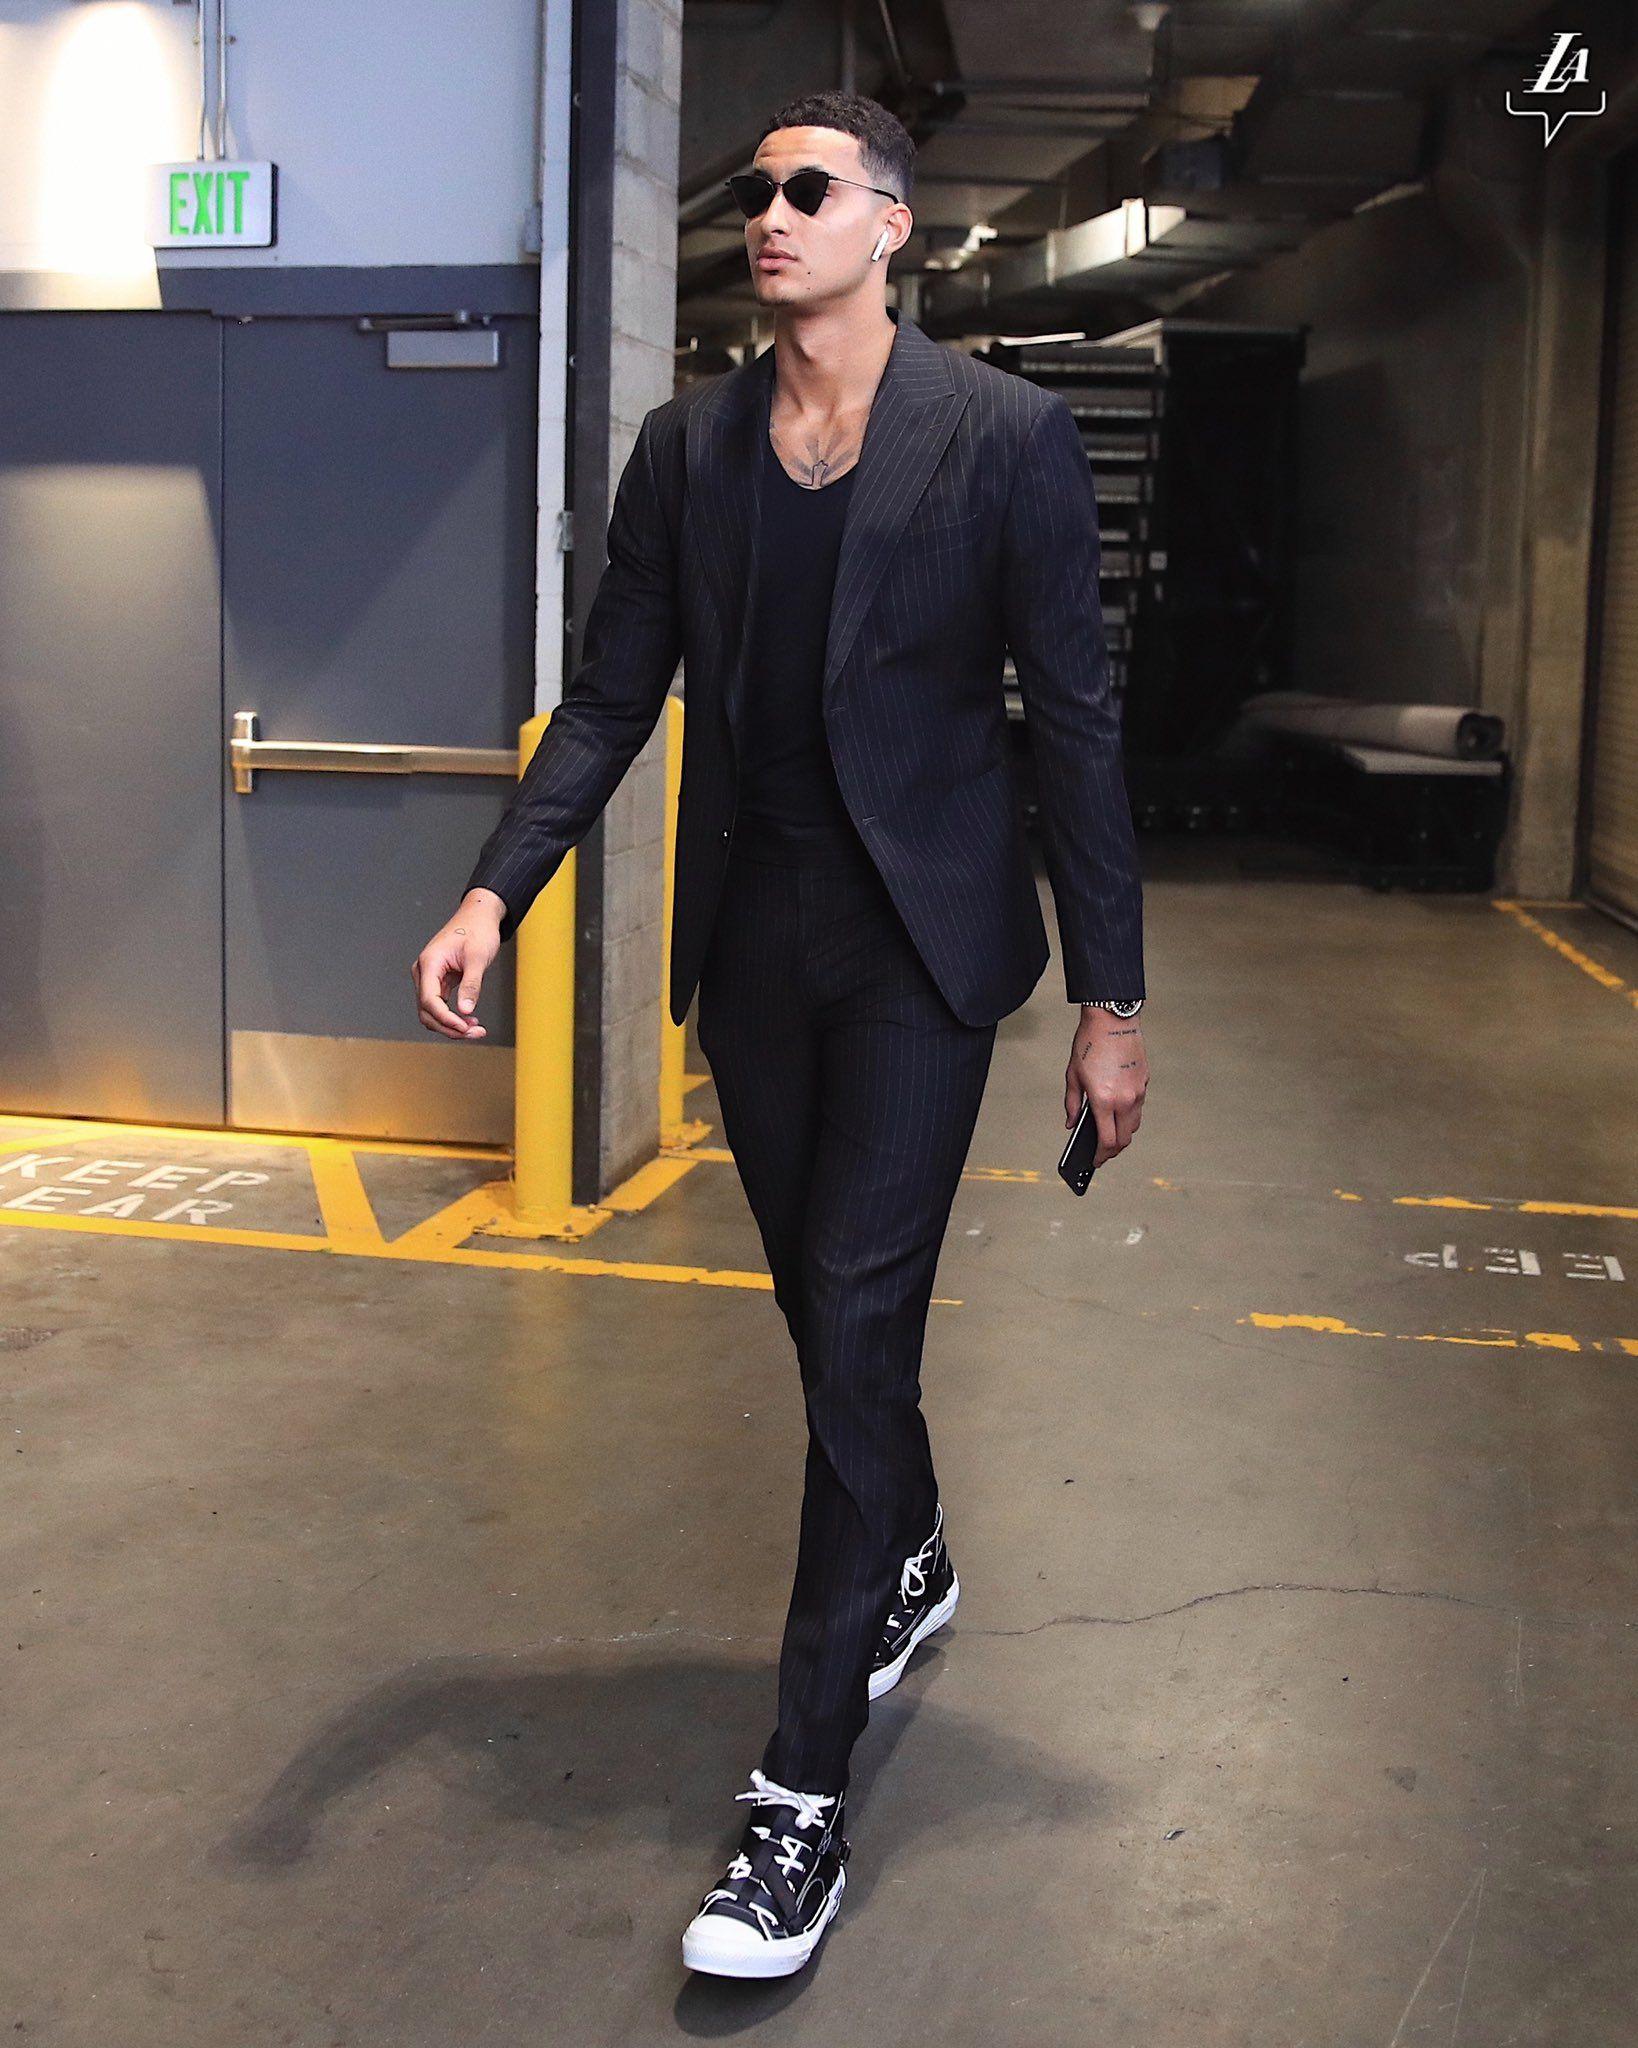 Los Angeles Lakers on Twitter   Nba fashion, Nba outfit, Kyle kuzma